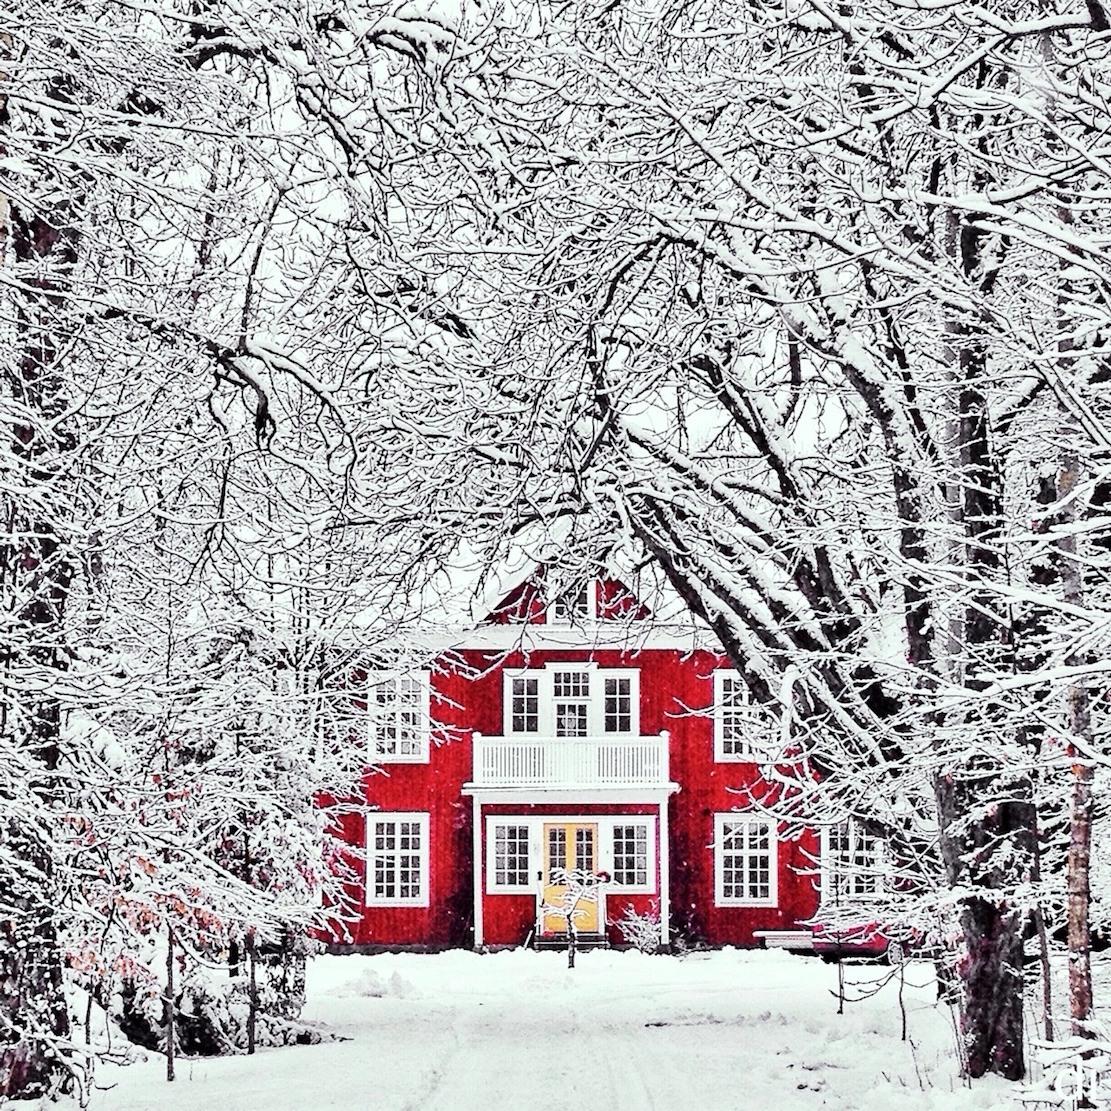 2019 year look- Wonderland Winter tumblr pictures